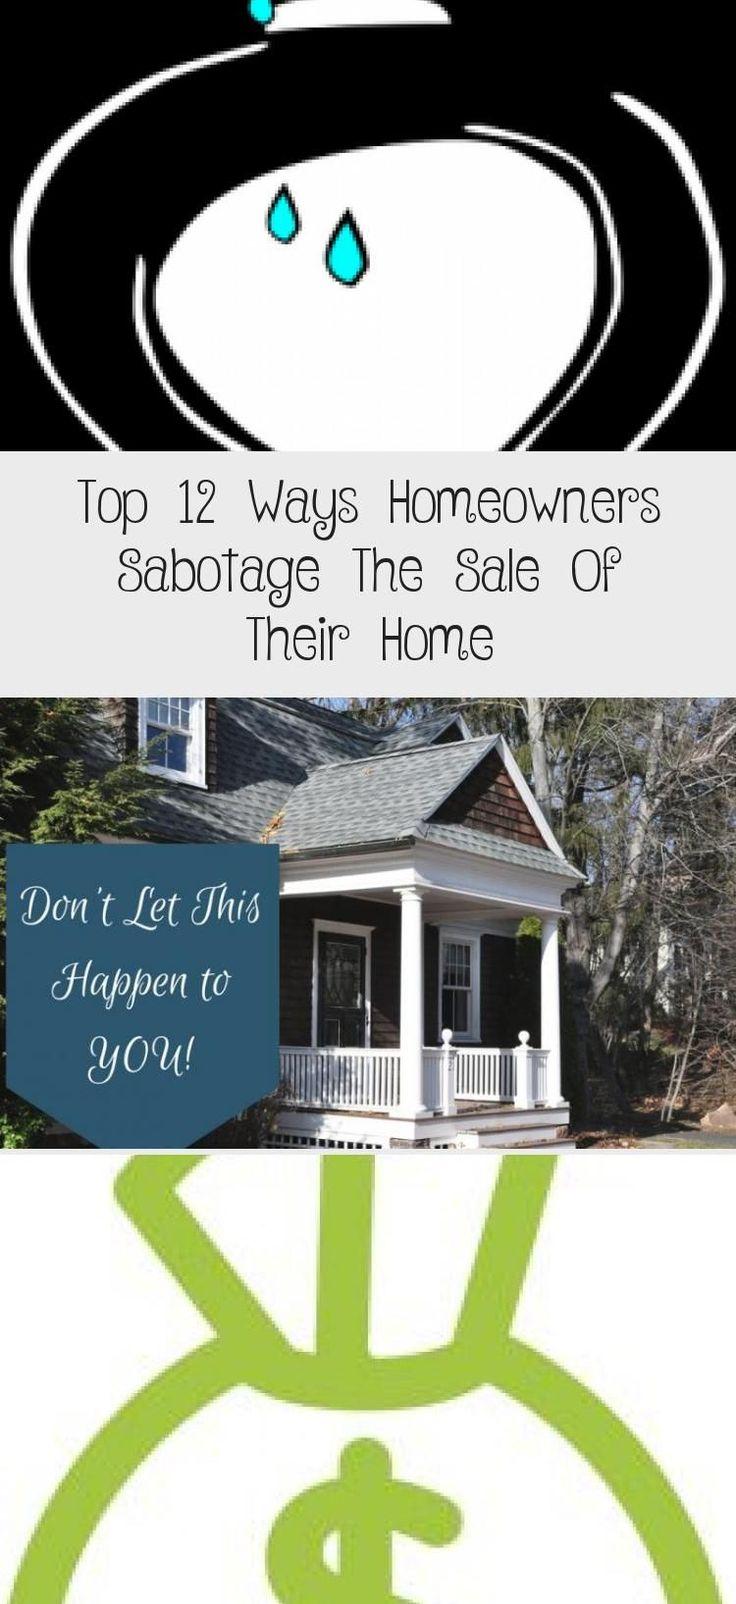 Top 12 Wege Wie Hausbesitzer Den Verkauf Ihres Hauses Sabotieren Haus Kaufen Den Haus In 2020